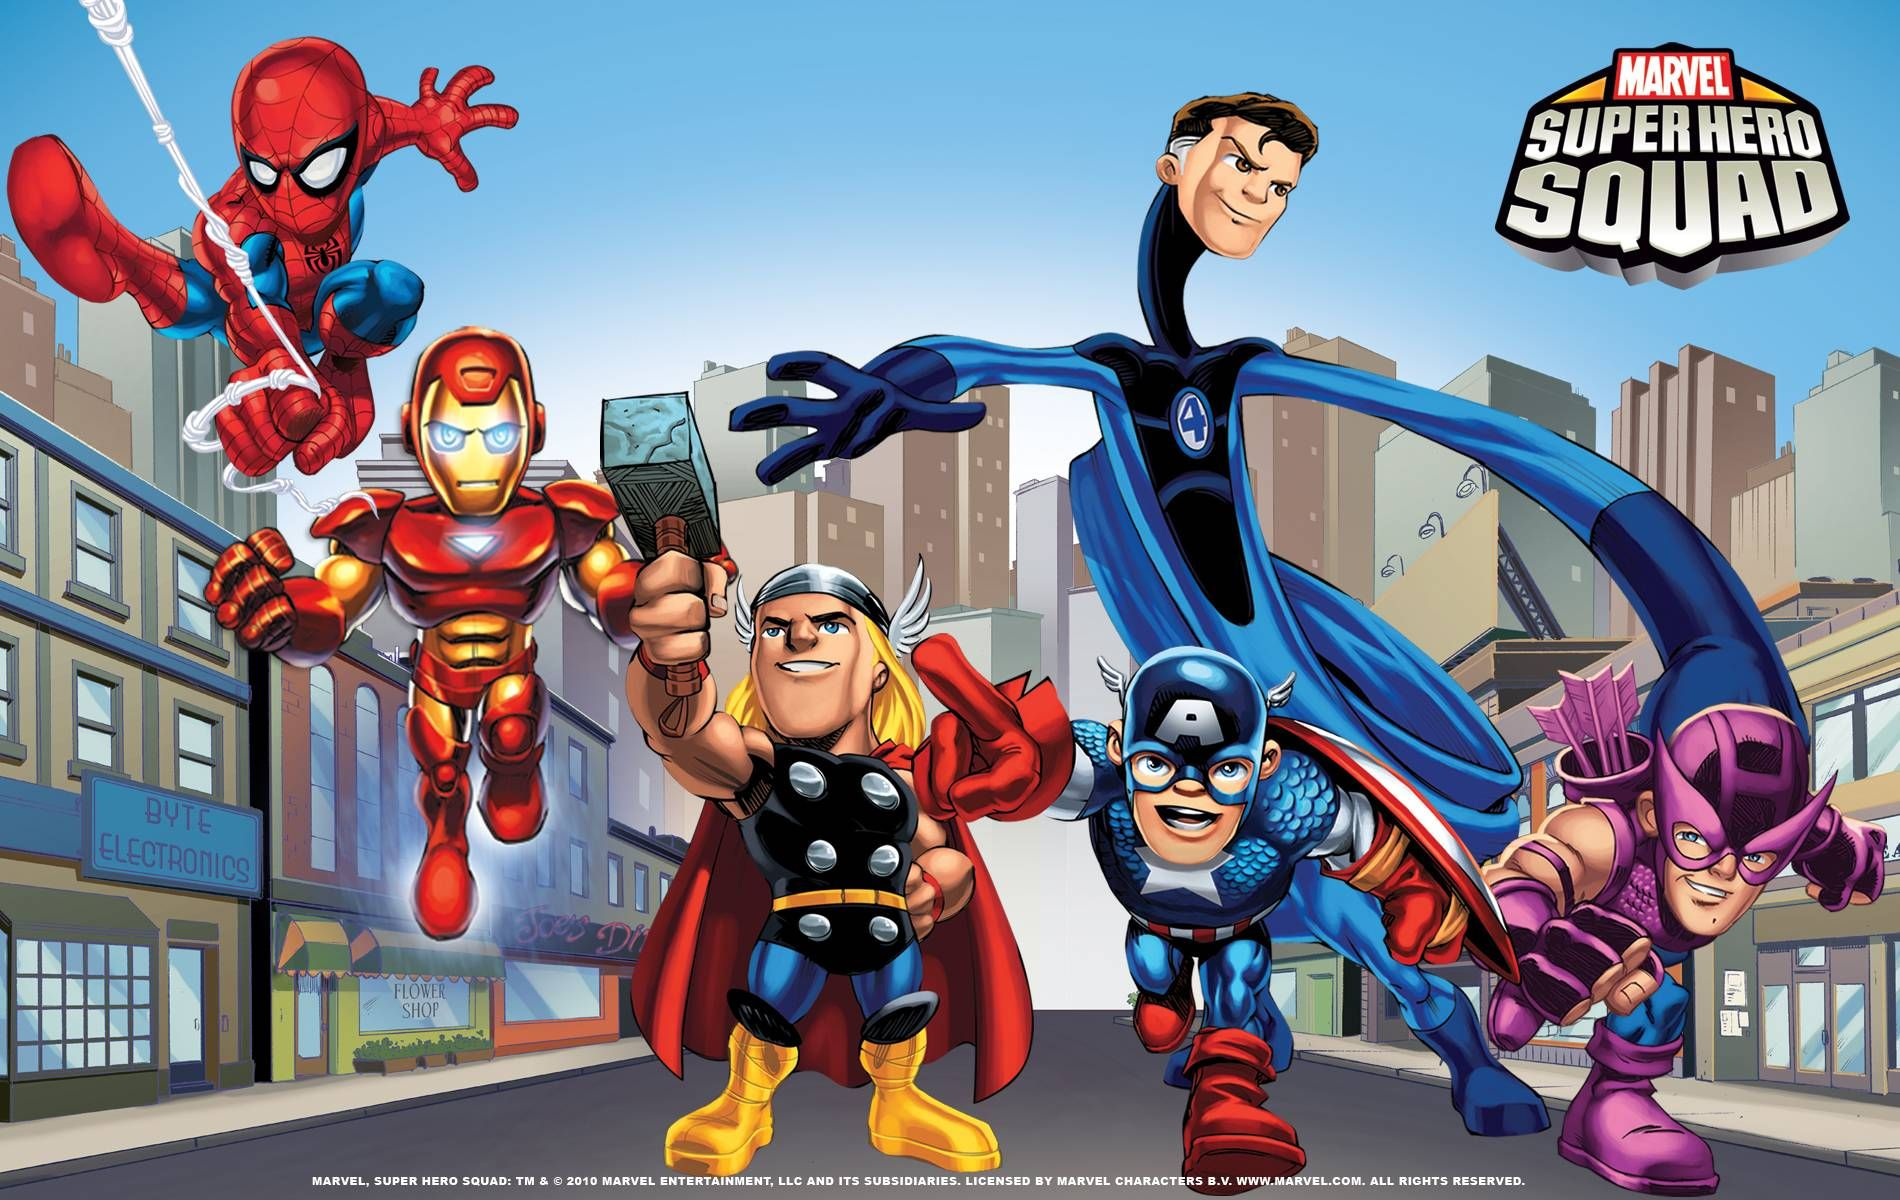 Ant Man Movie Marvel Comic Wallpaper | HD Wallpapers | Pinterest ...